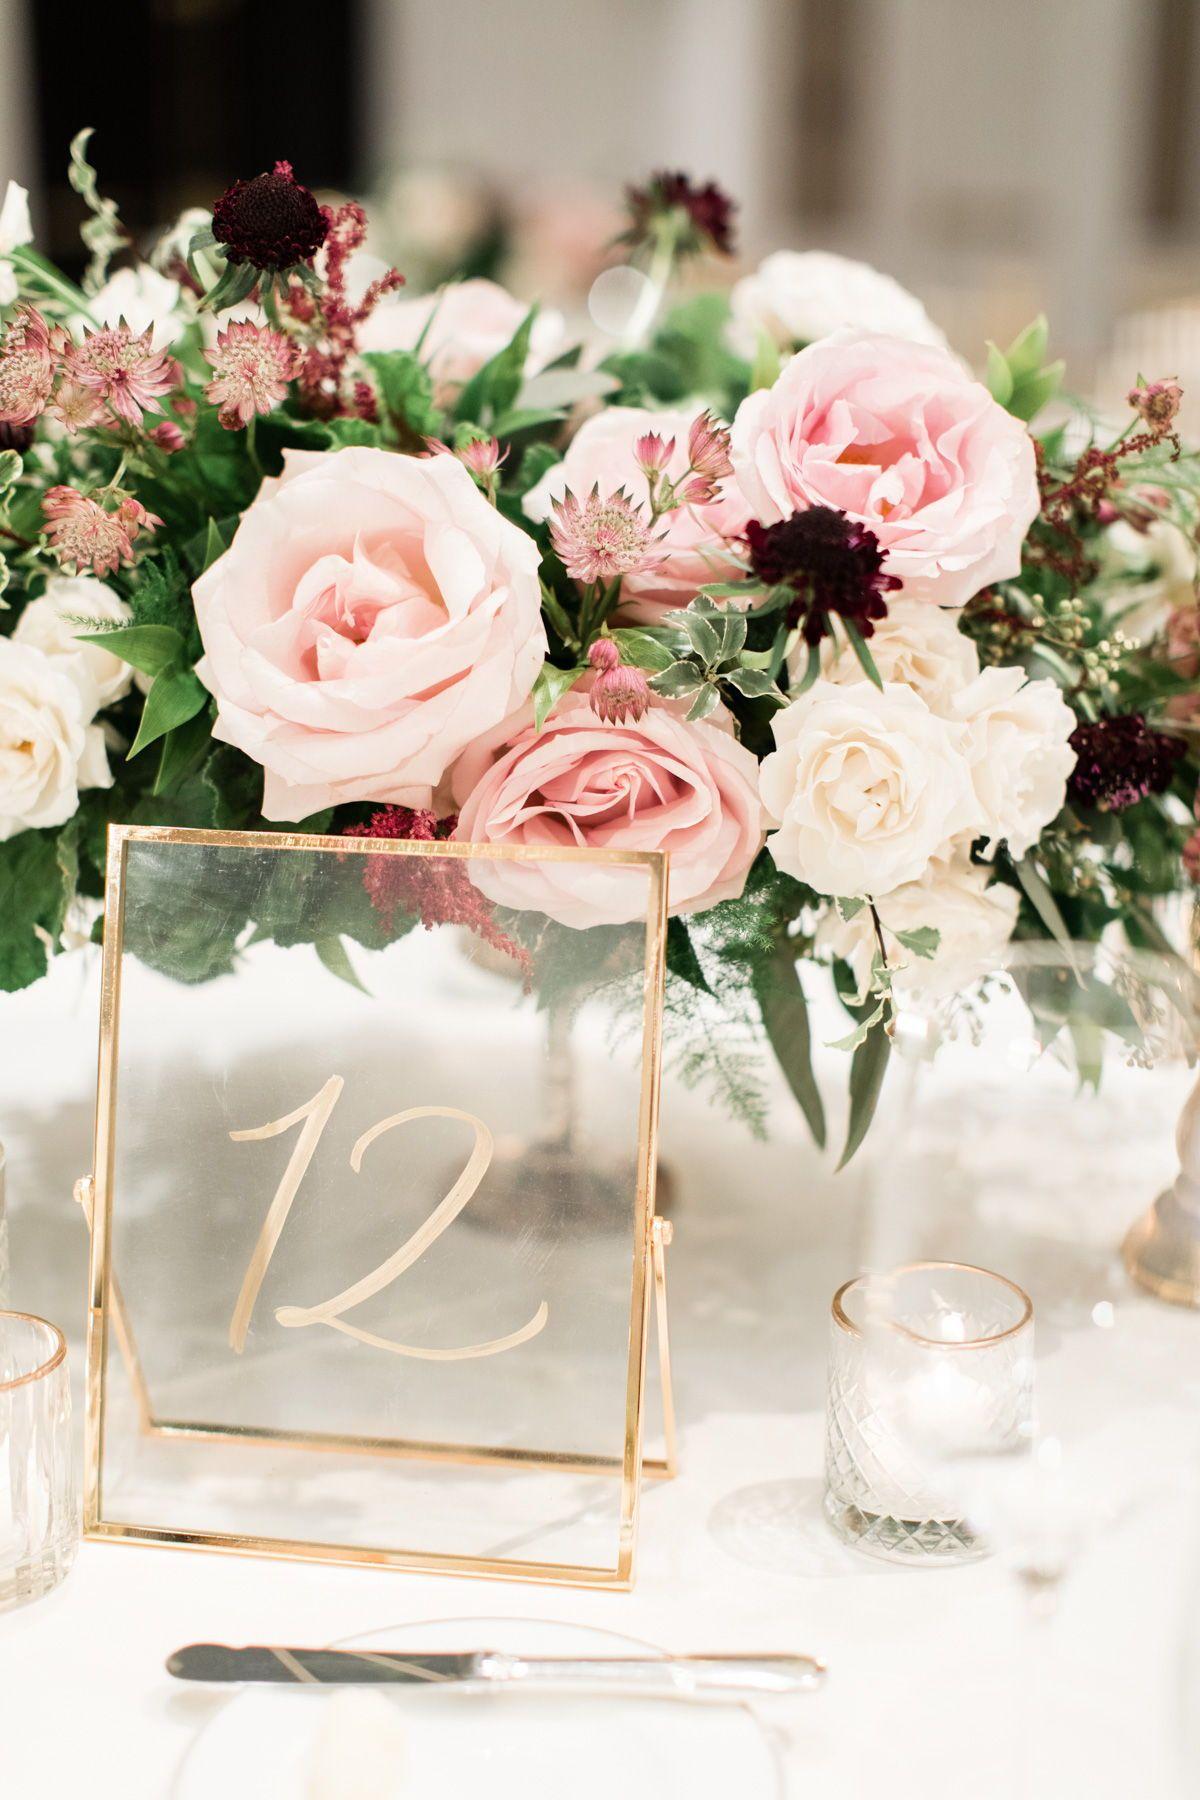 San Diego Wedding Photographer Cavin Elizabeth Photography Wedding Table Pink Pink And Burgundy Wedding Pink Wedding Flowers